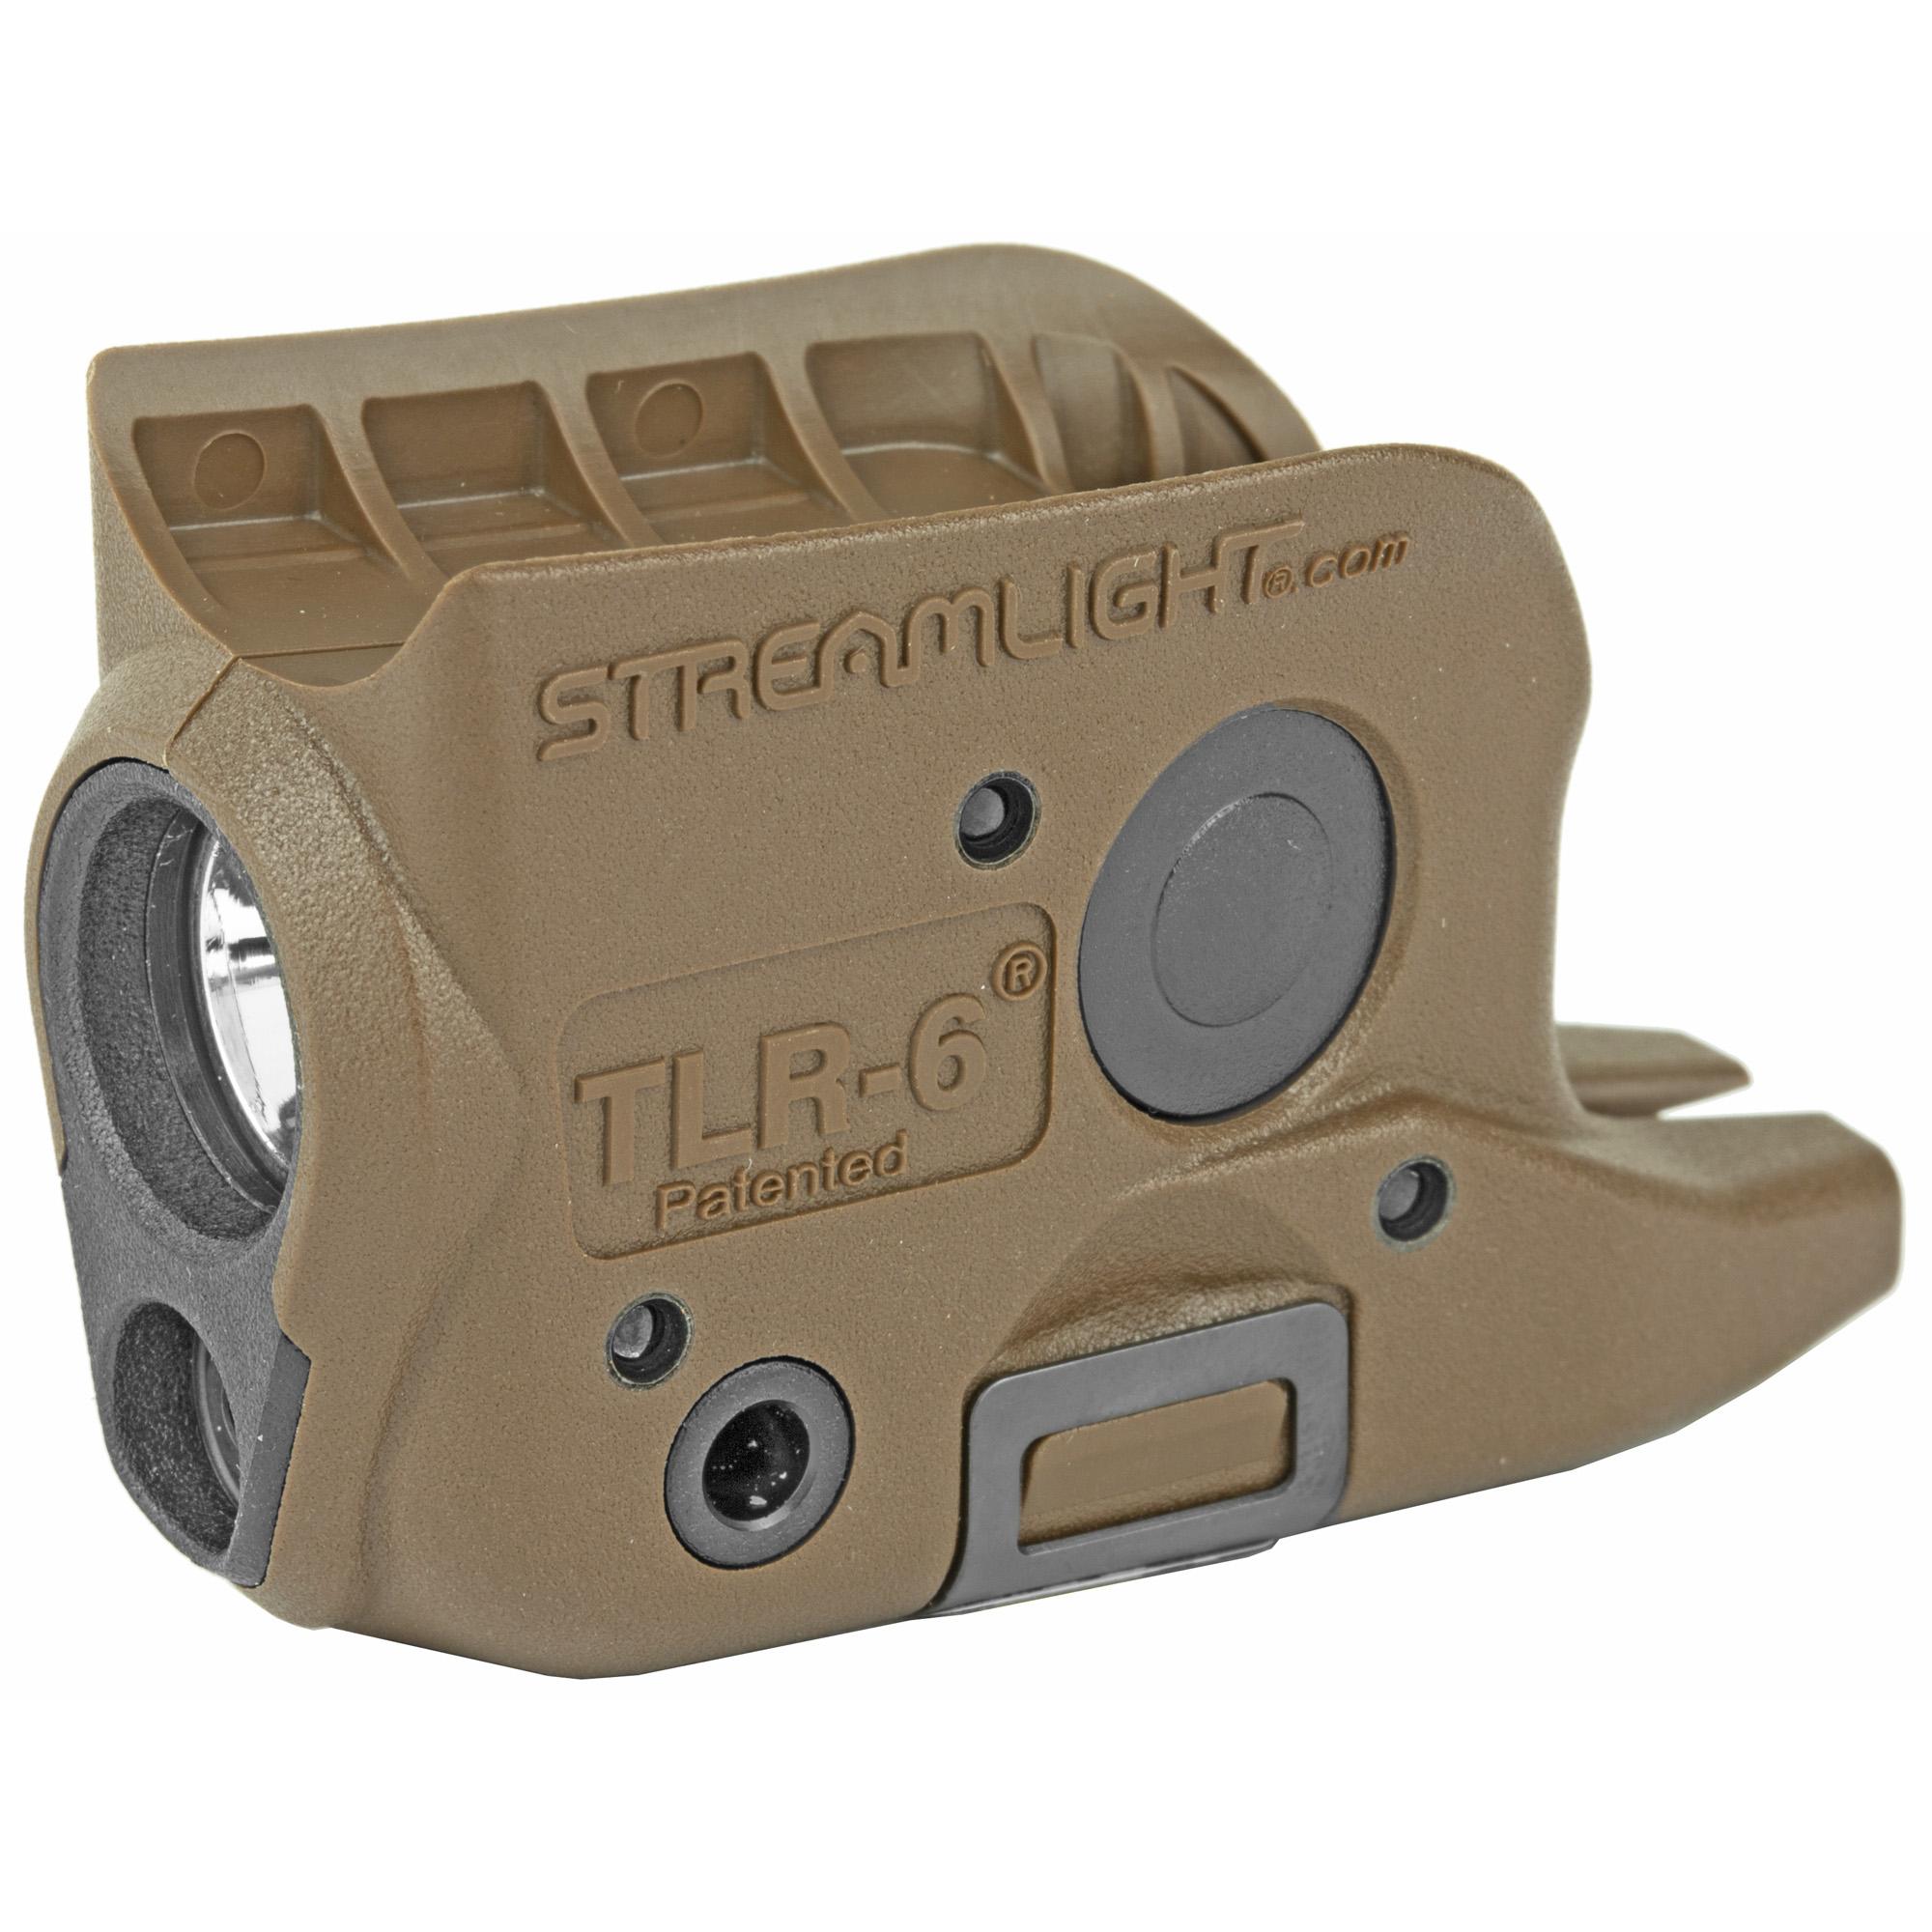 Strmlght Tlr-6 For Glk 42/43 Fdebrwn